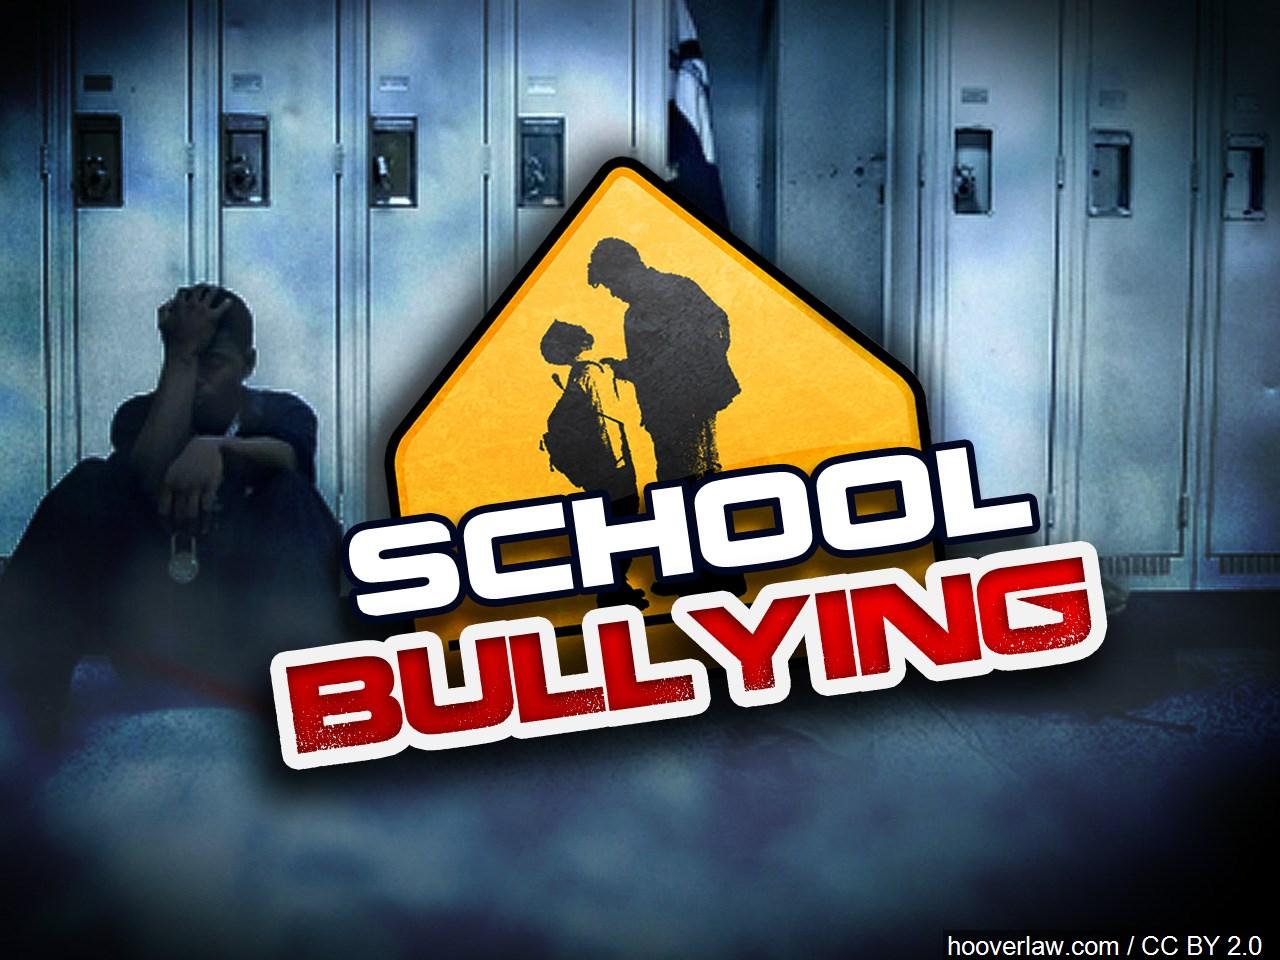 bullying_1471710779341-3156084.jpg